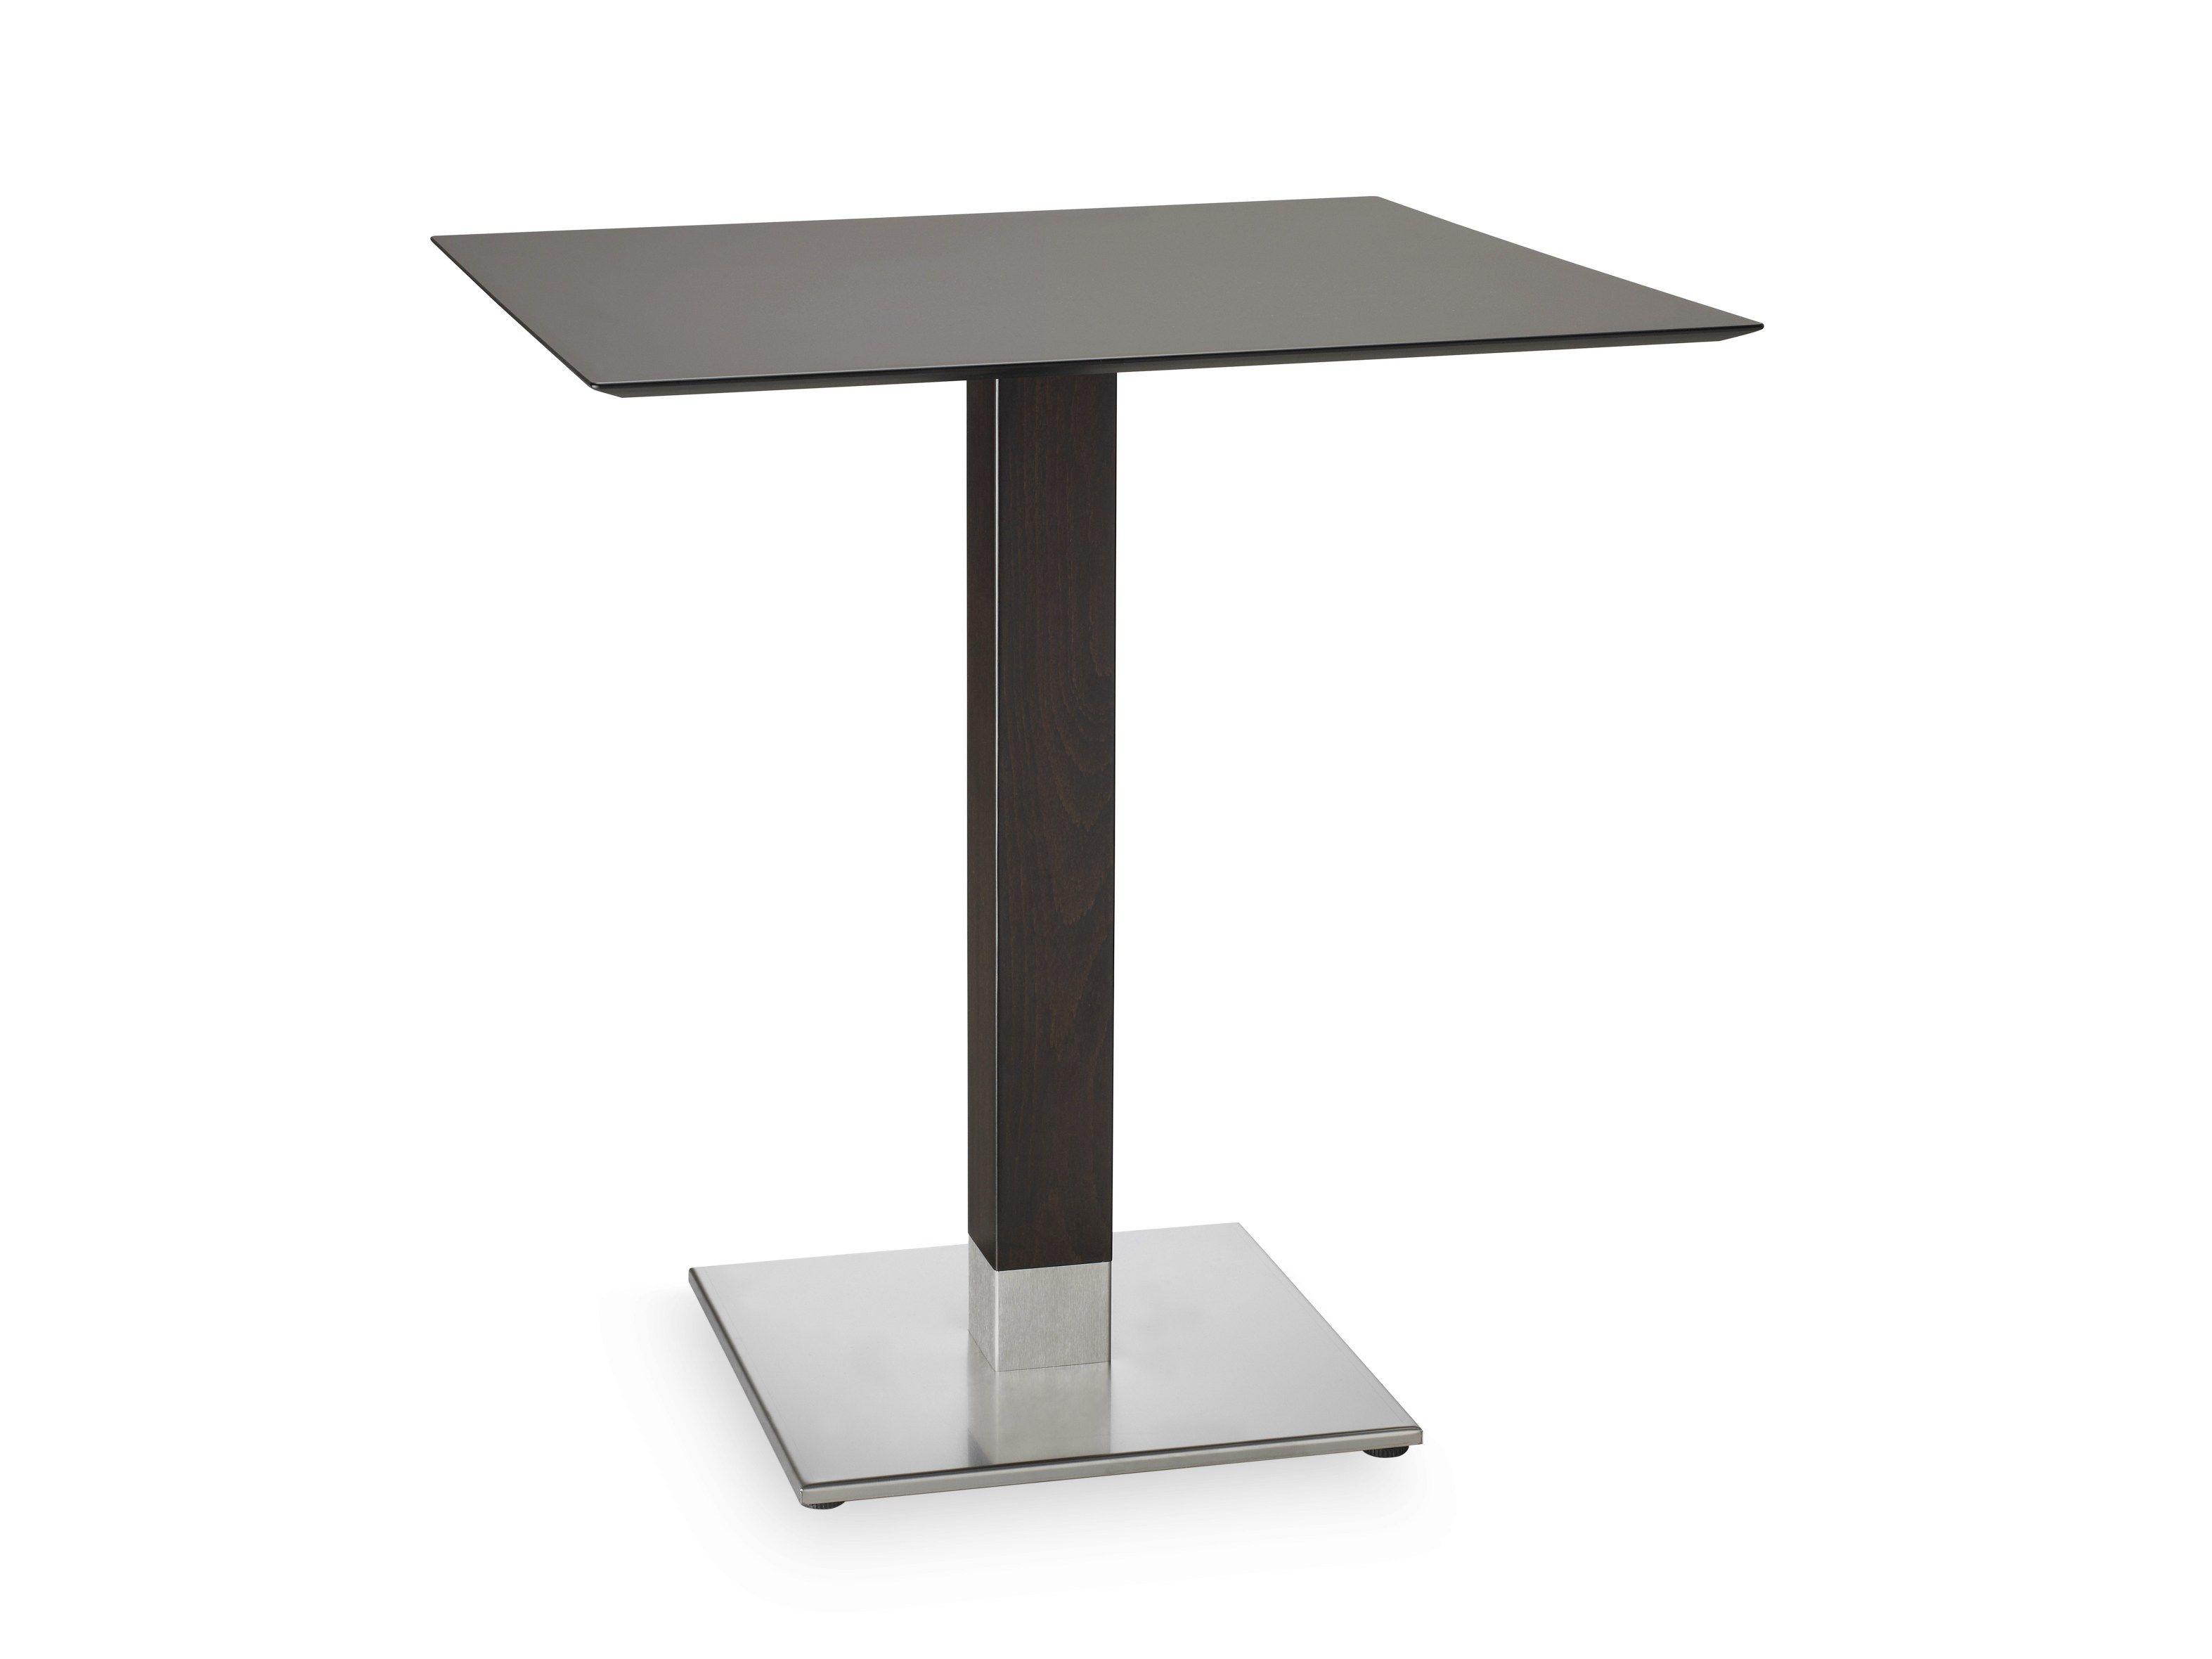 Square restaurant tables - Square Restaurant Tables 6